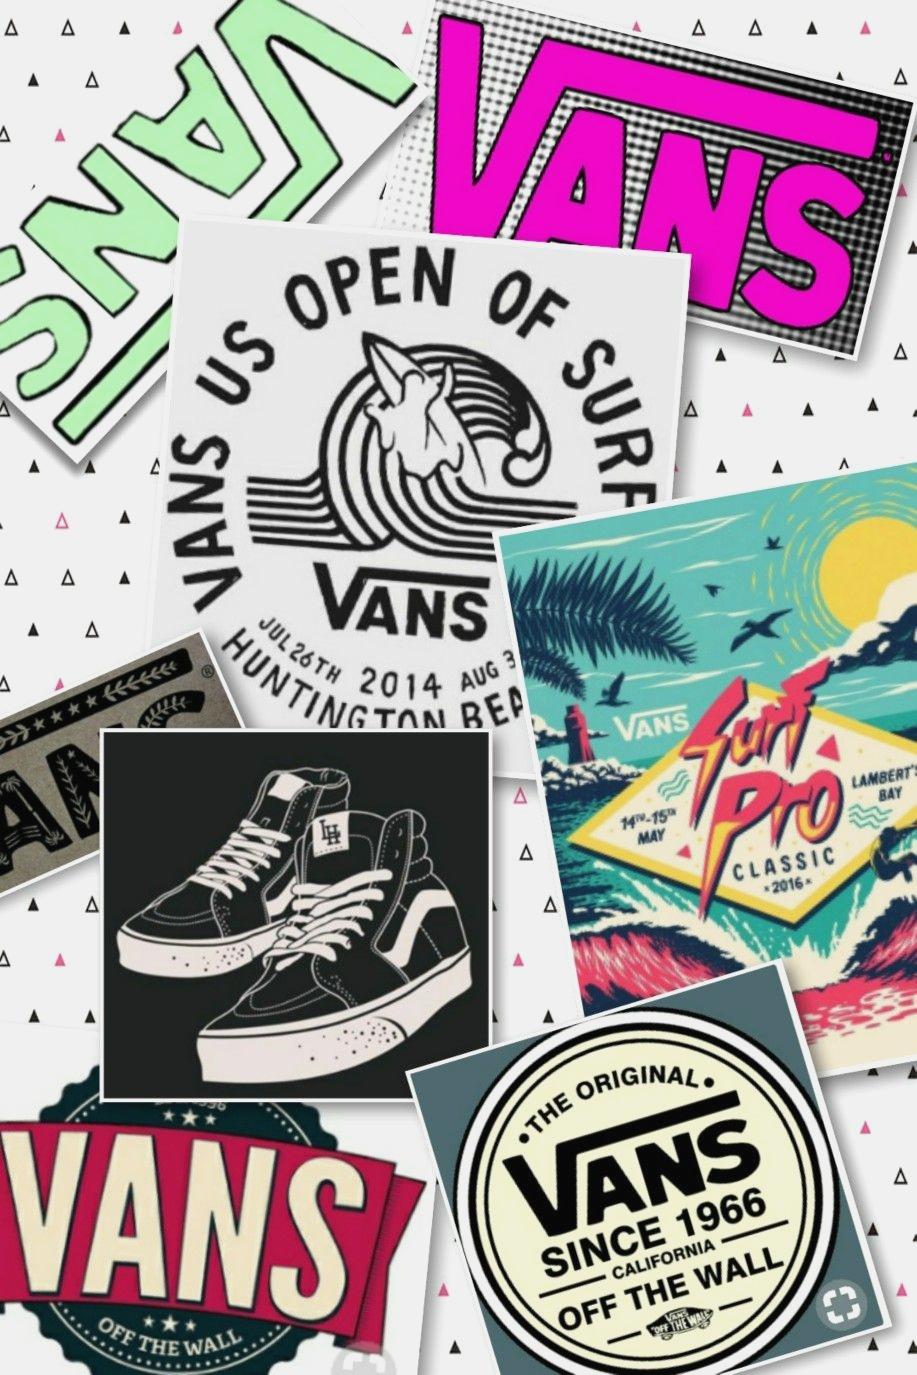 Achtergrond Iphone 5s Wallpaper Tumblr Wallpaper Cool